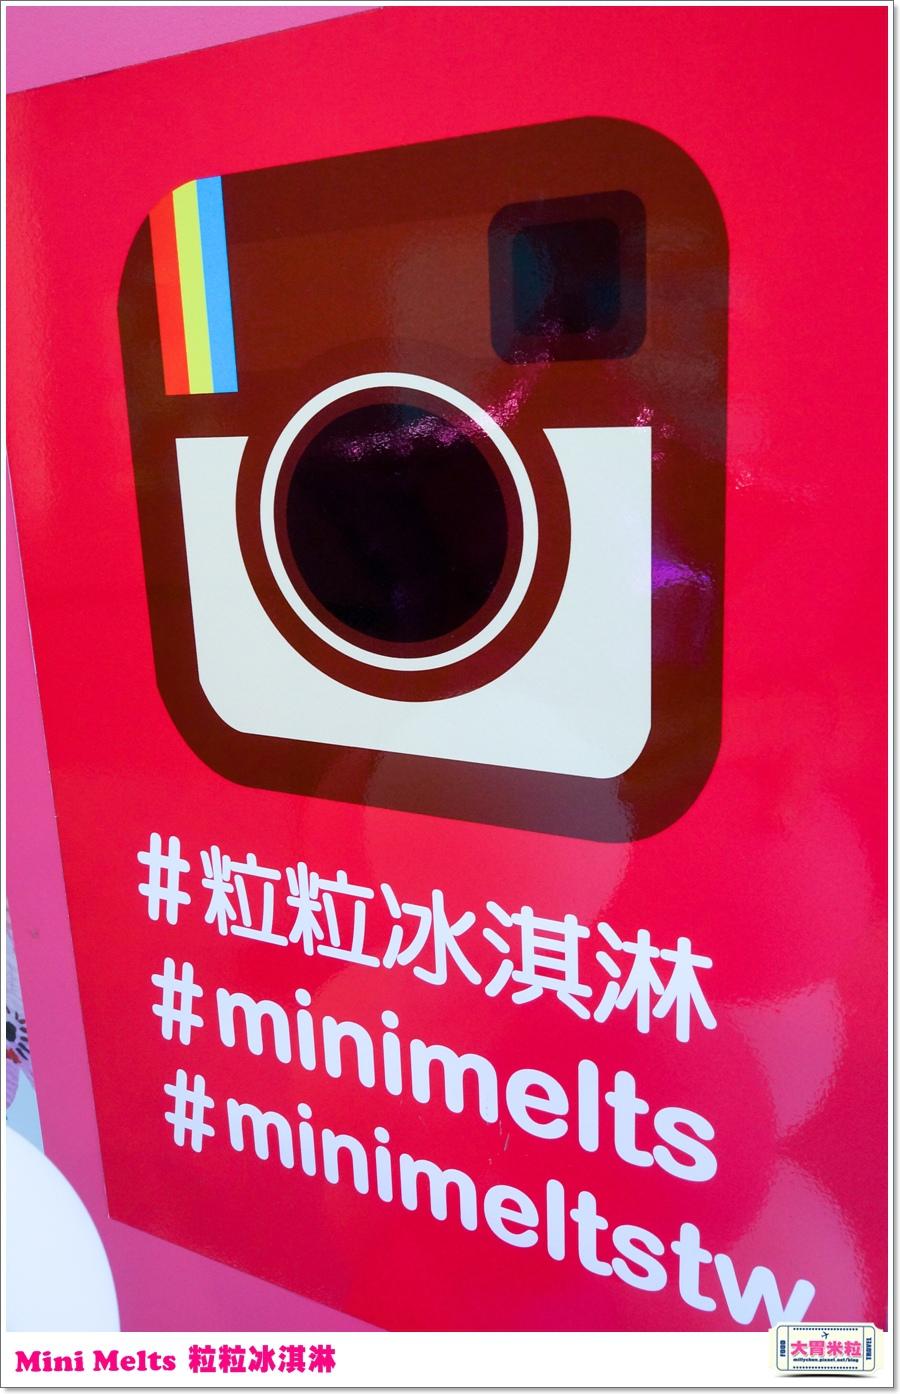 Mini Melts粒粒冰淇淋0027.jpg